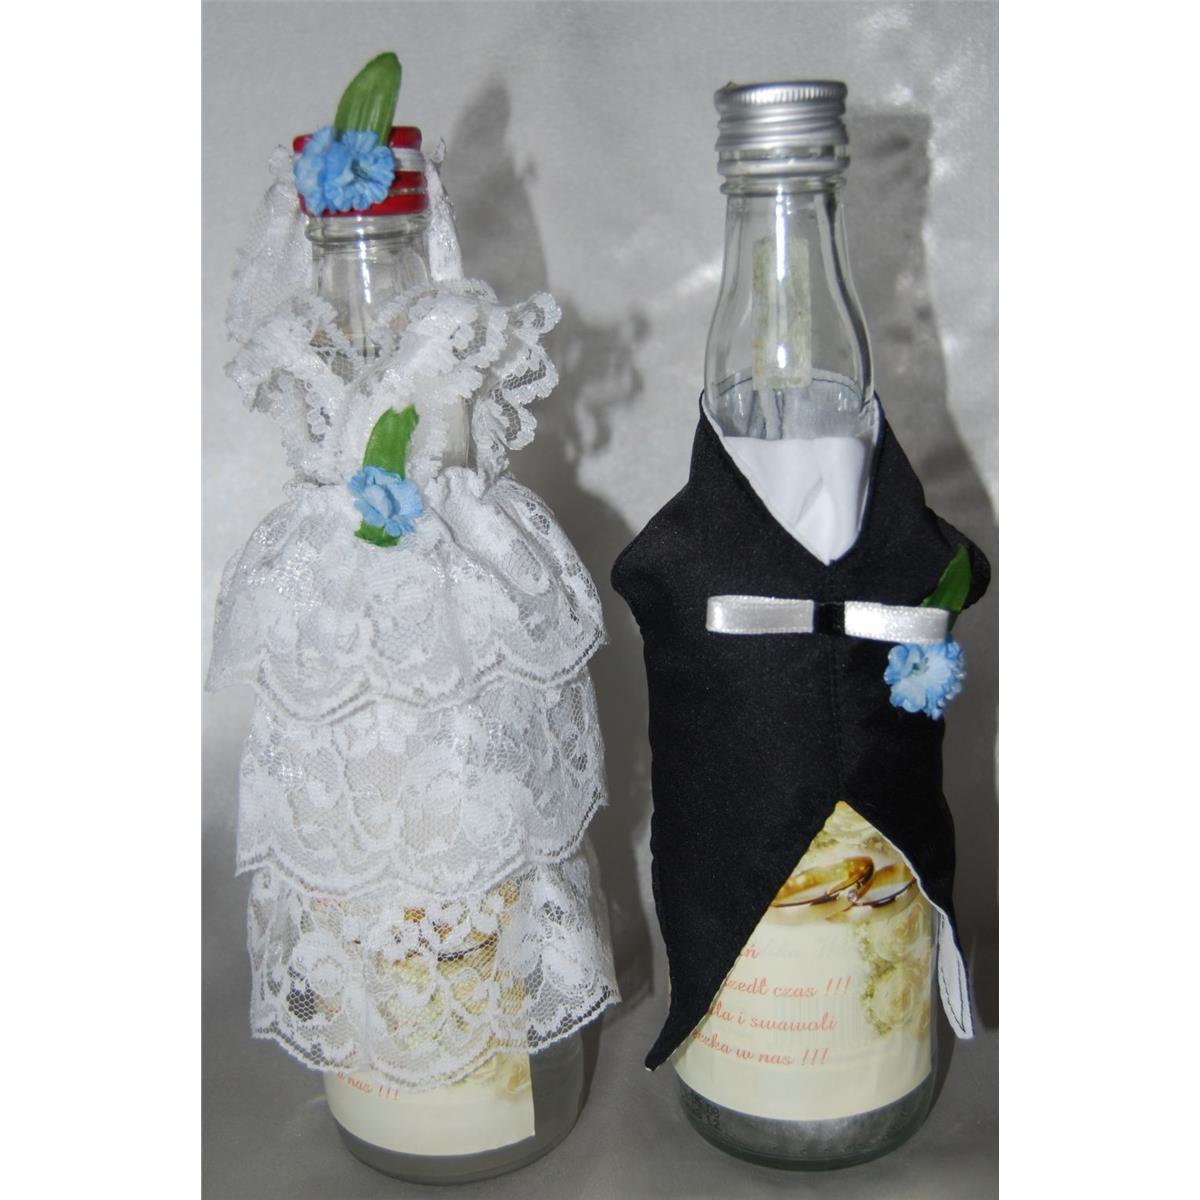 b0d43bc86a Ubranka na butelkę wódki - Koronka jesień-2088